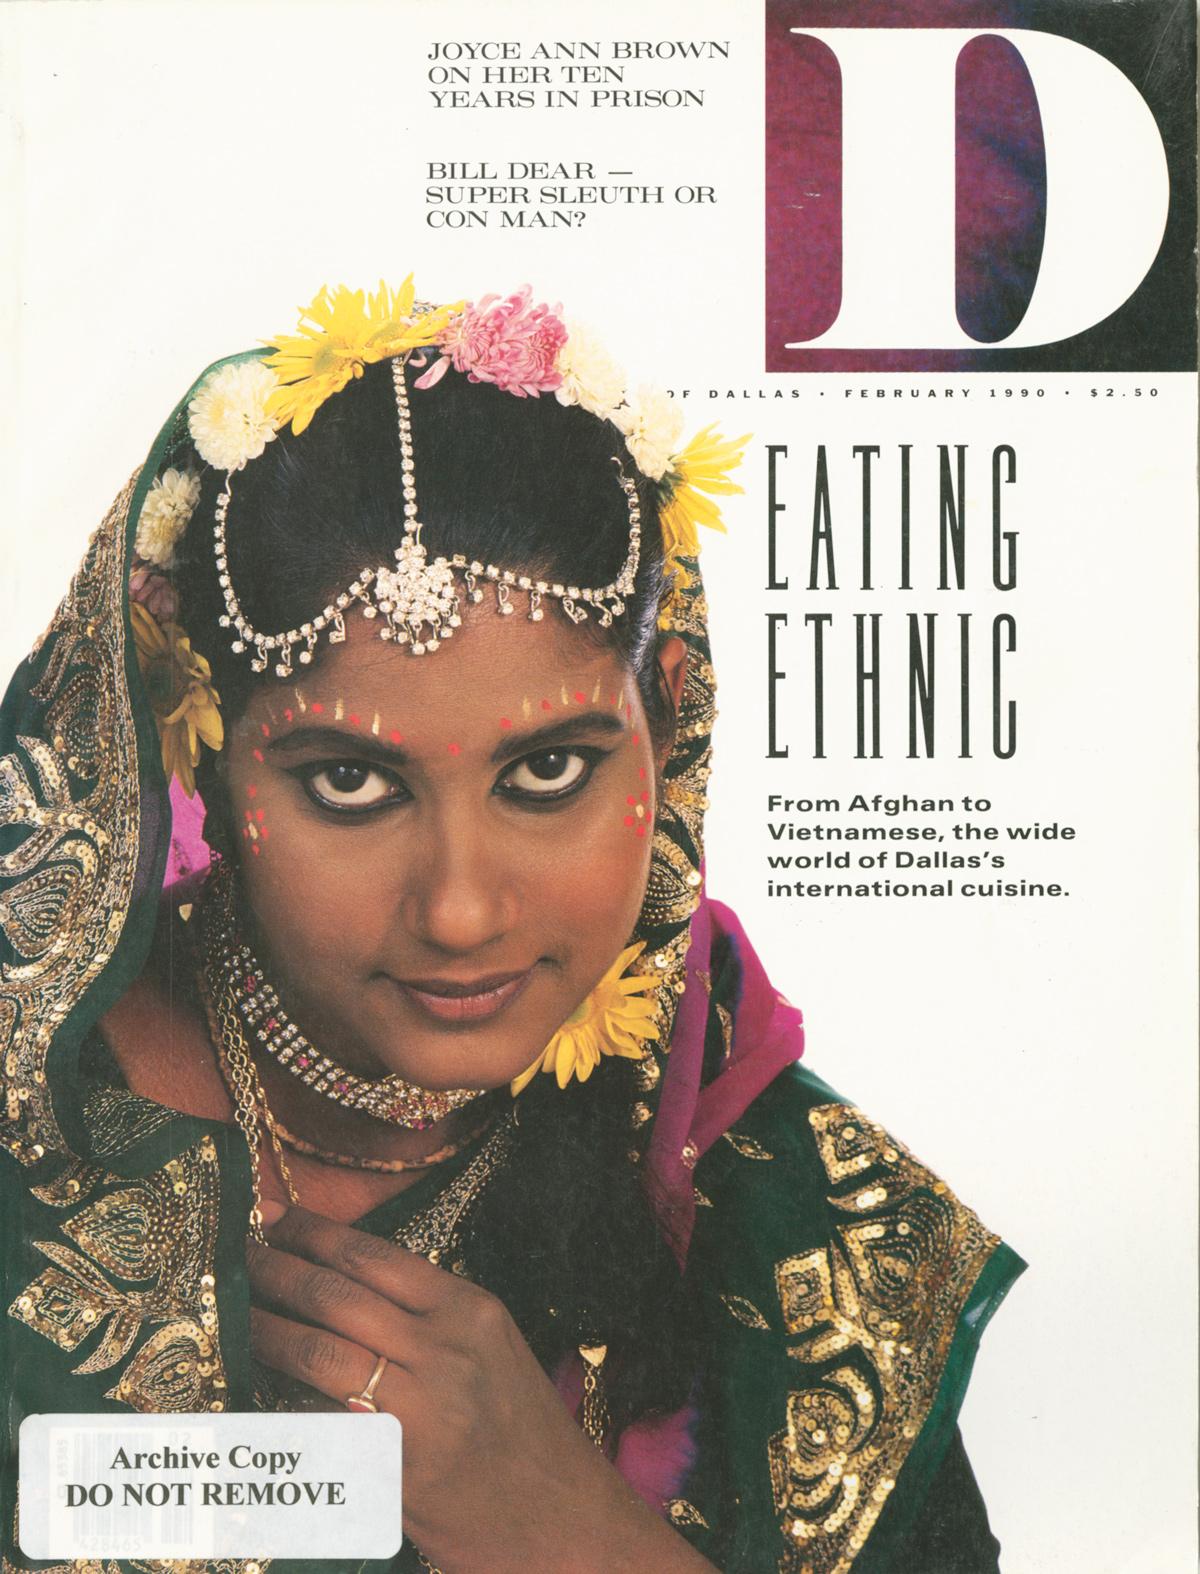 February 1990 cover